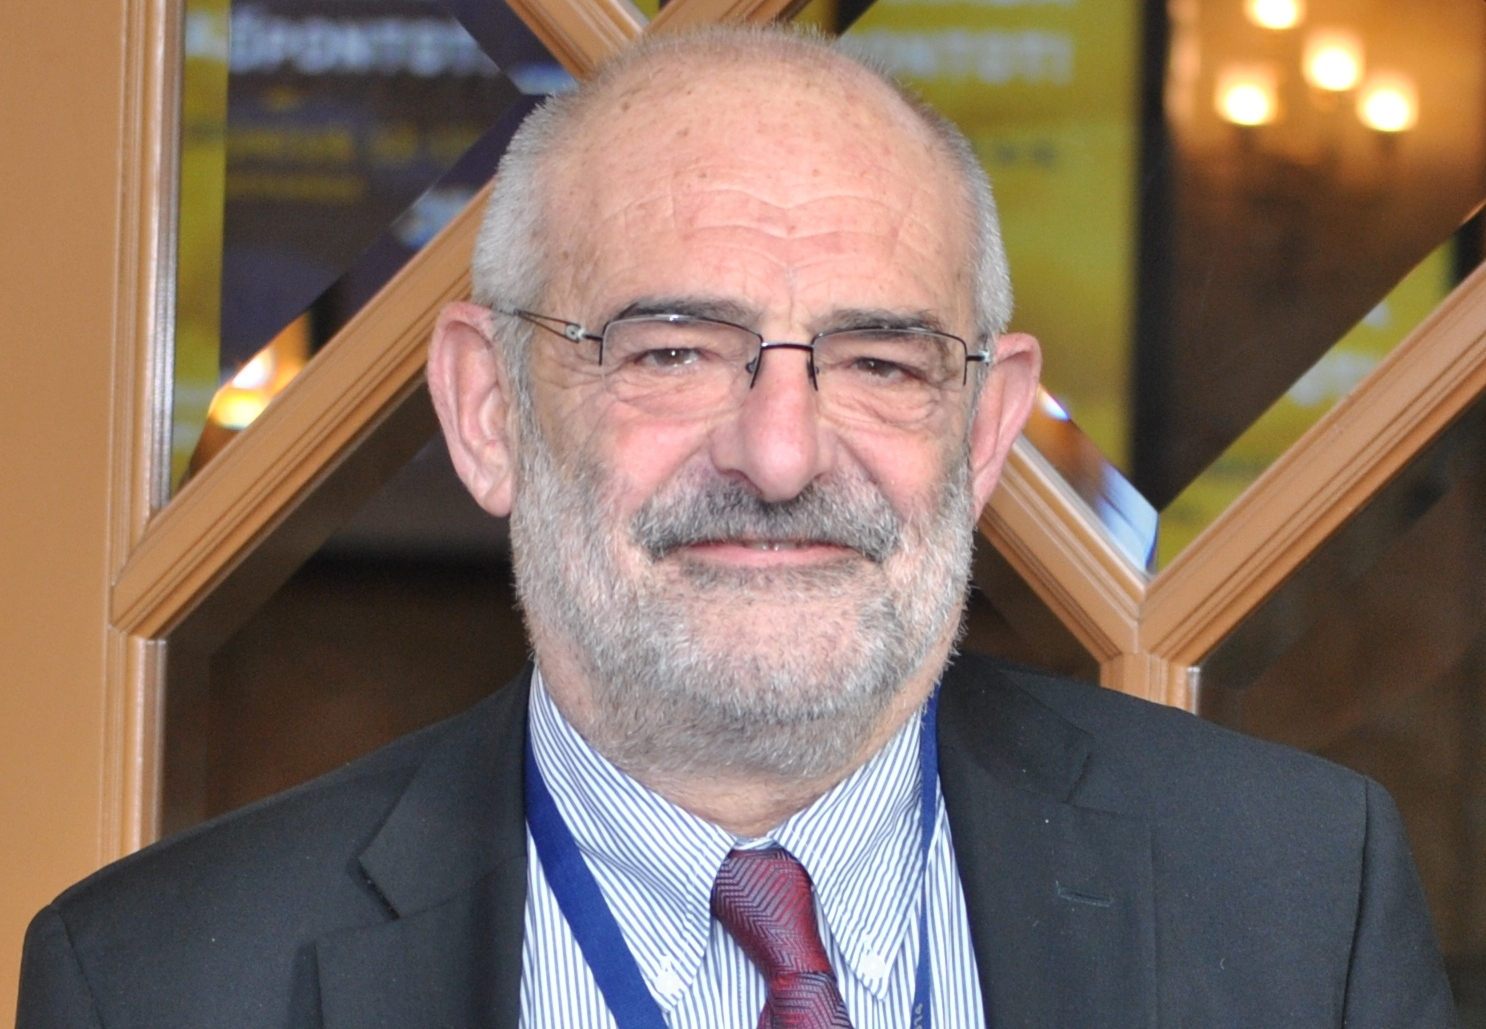 Jean Yves Douillard professzor